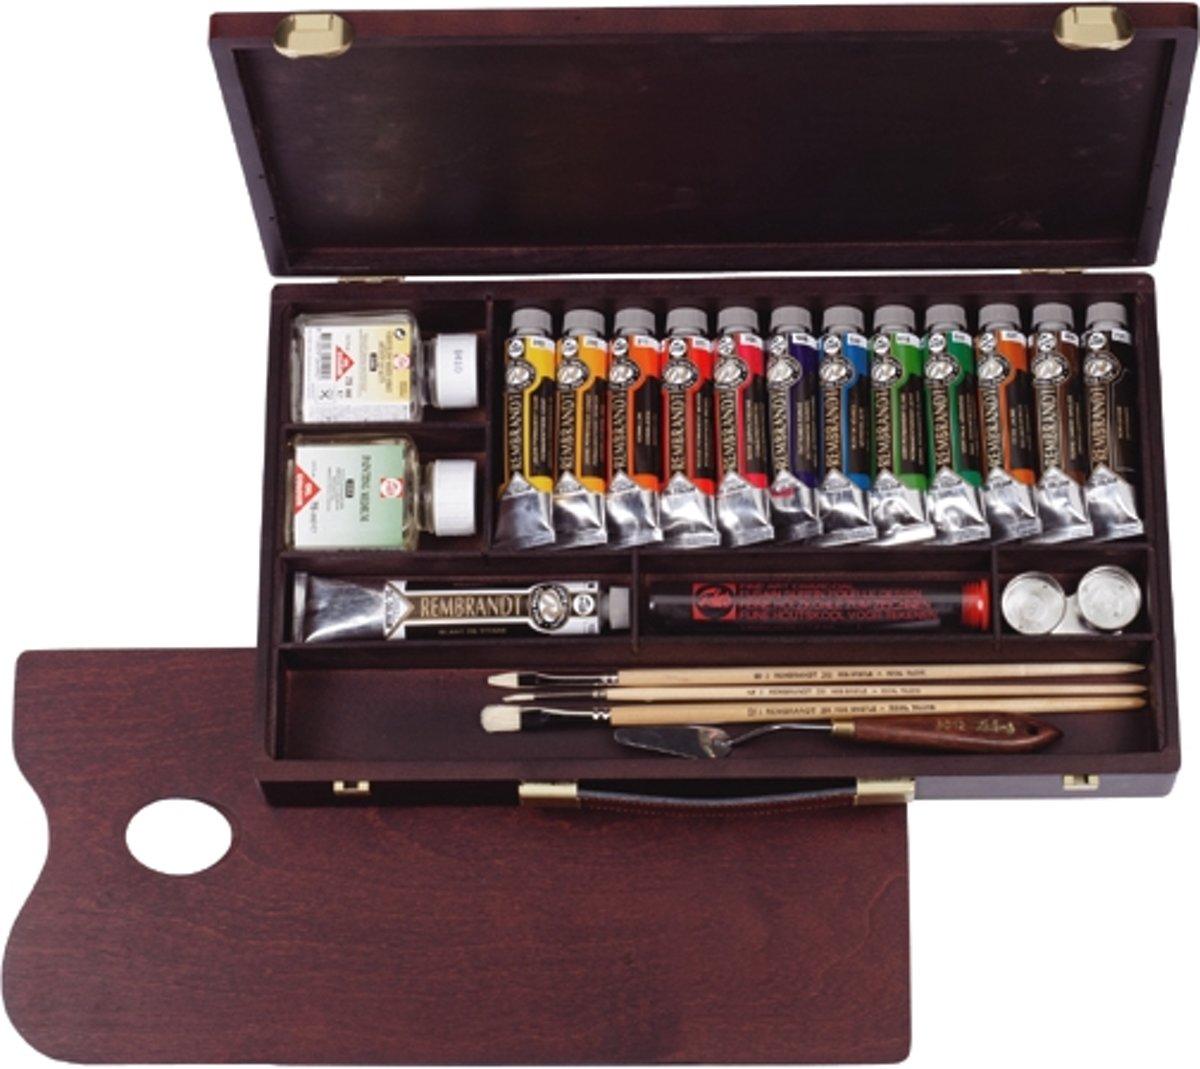 Rembrandt olieverf kist 13 tubes met accessoires - Professional kopen